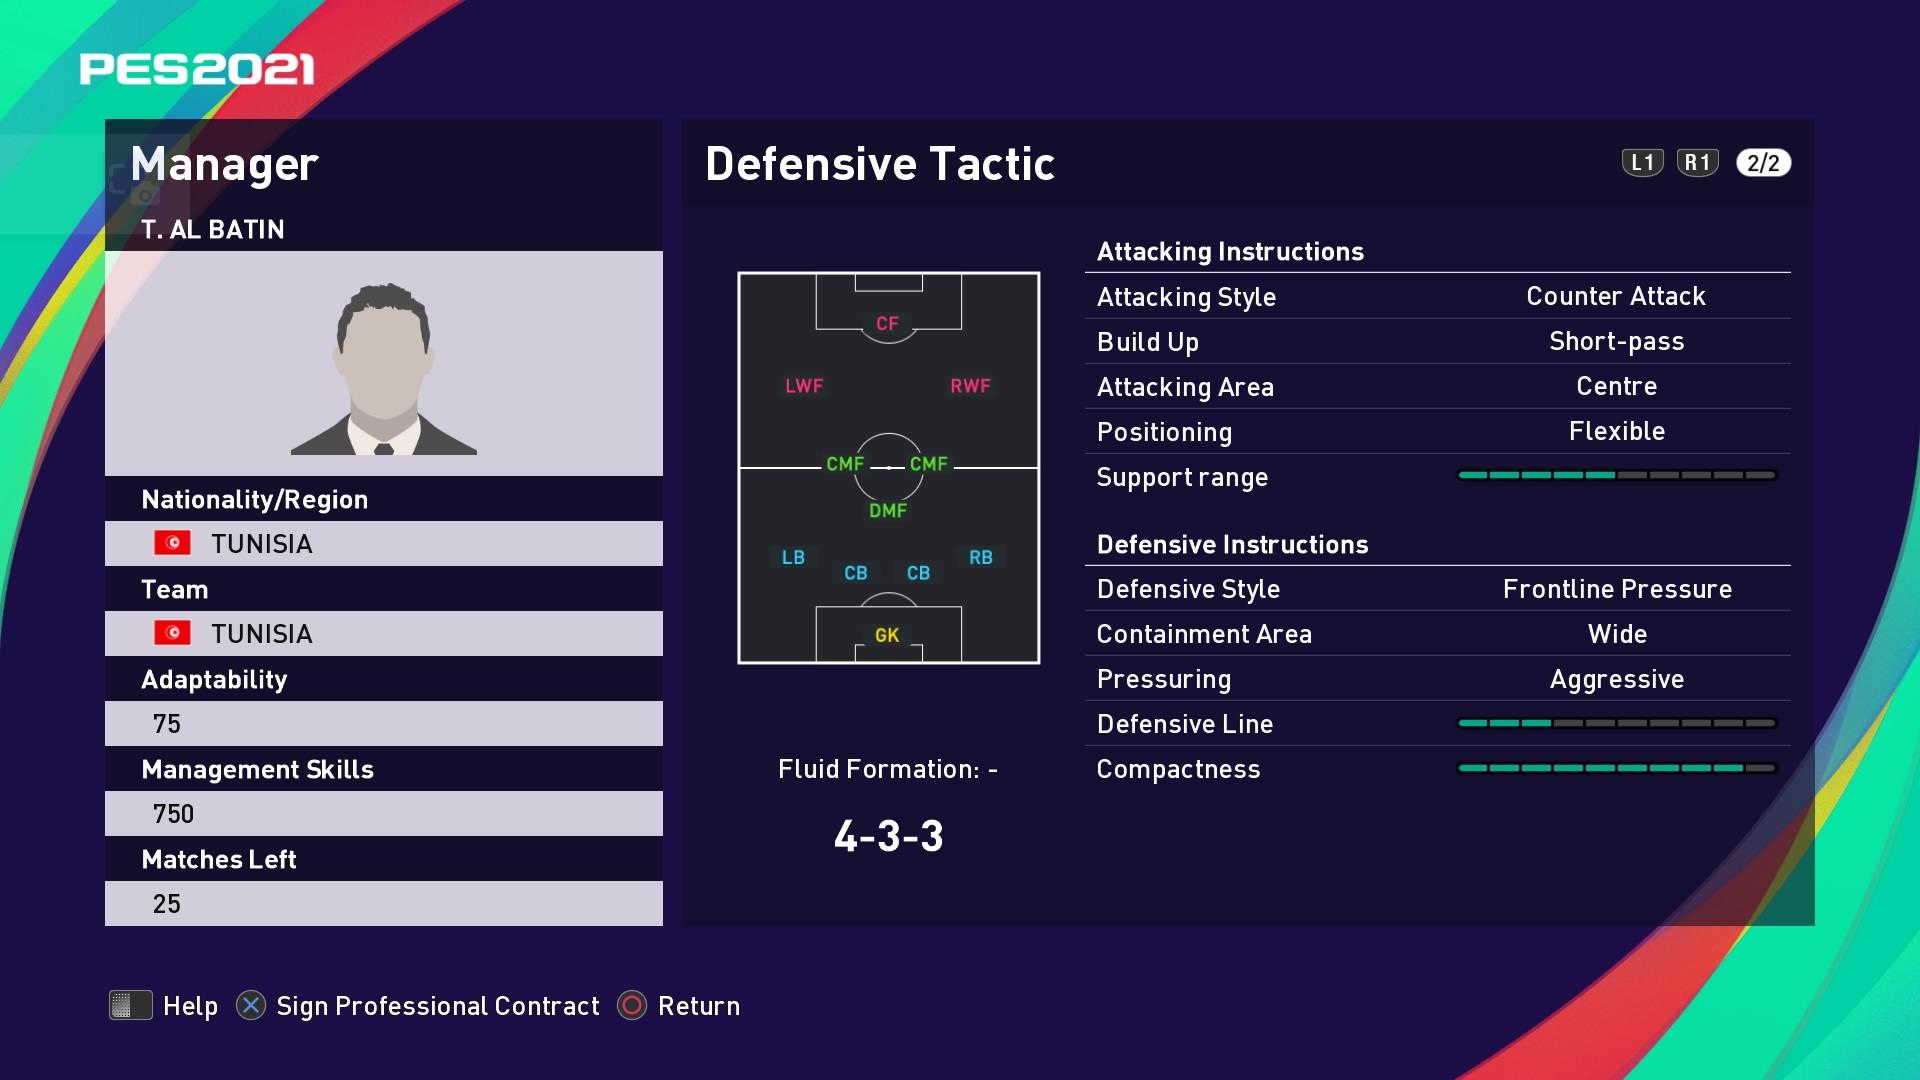 T. Al Batin (Mondher Kebaier) Defensive Tactic in PES 2021 myClub